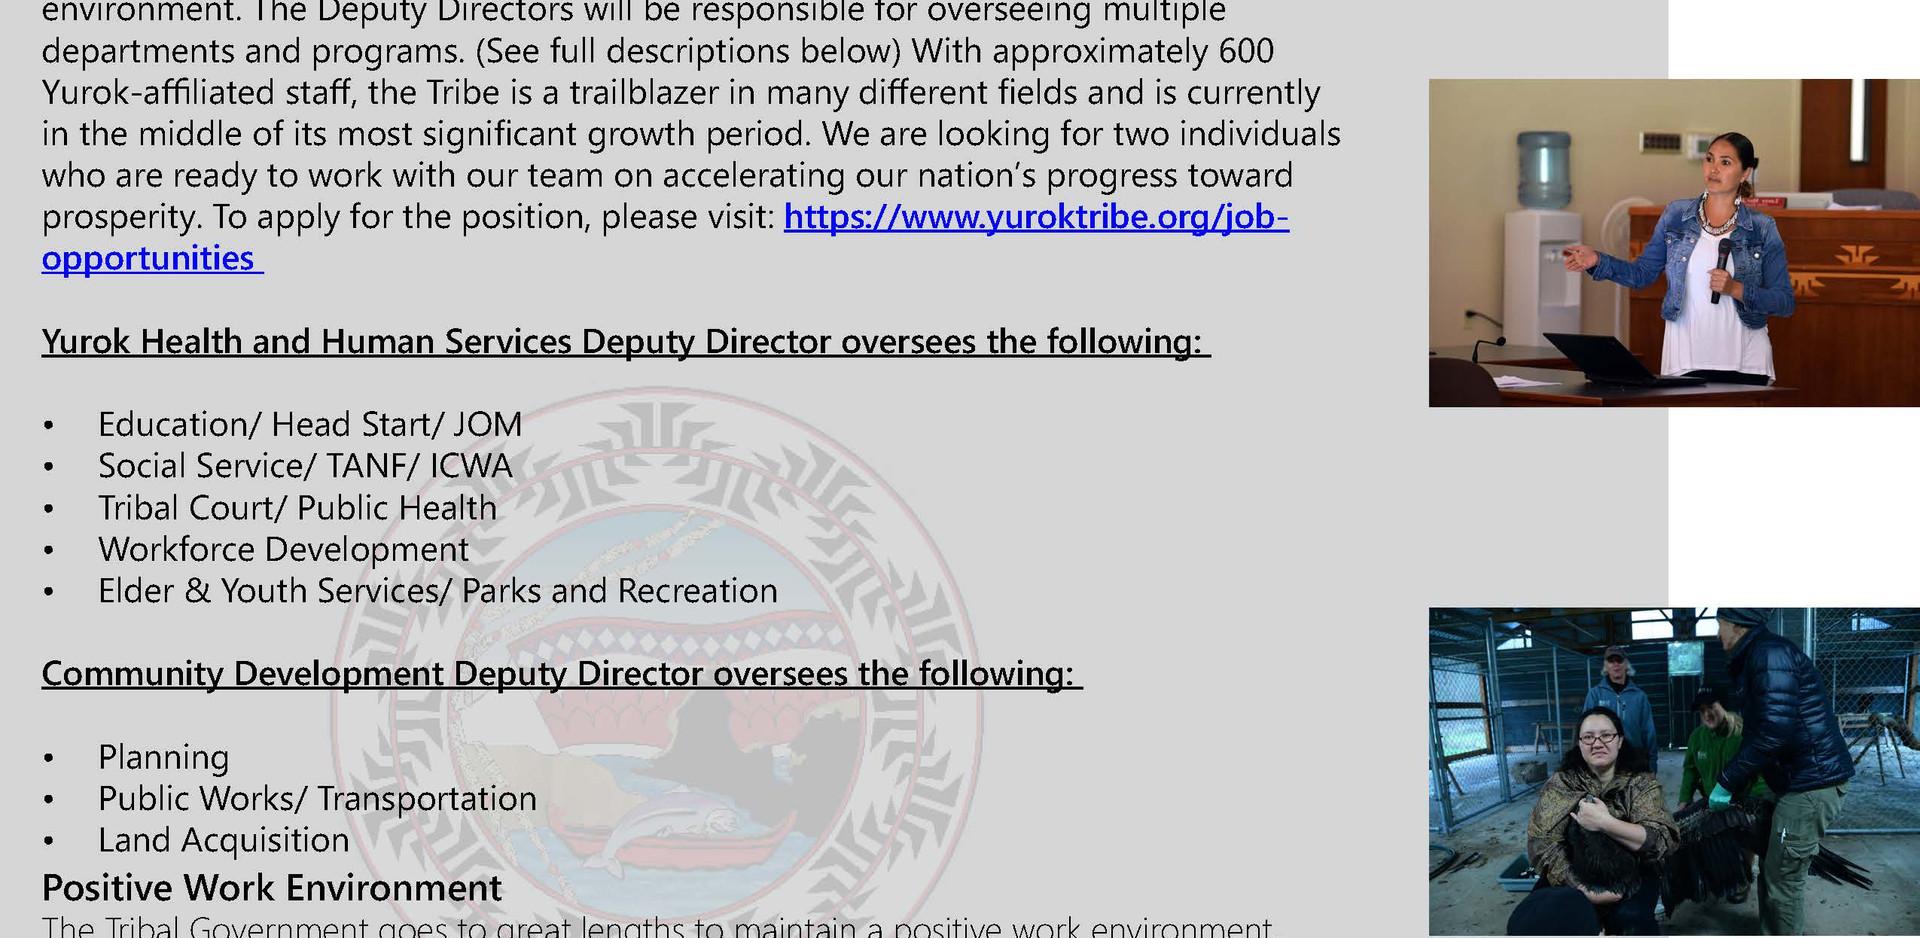 The Yurok Tribe is Hiring Two Deputy Directors